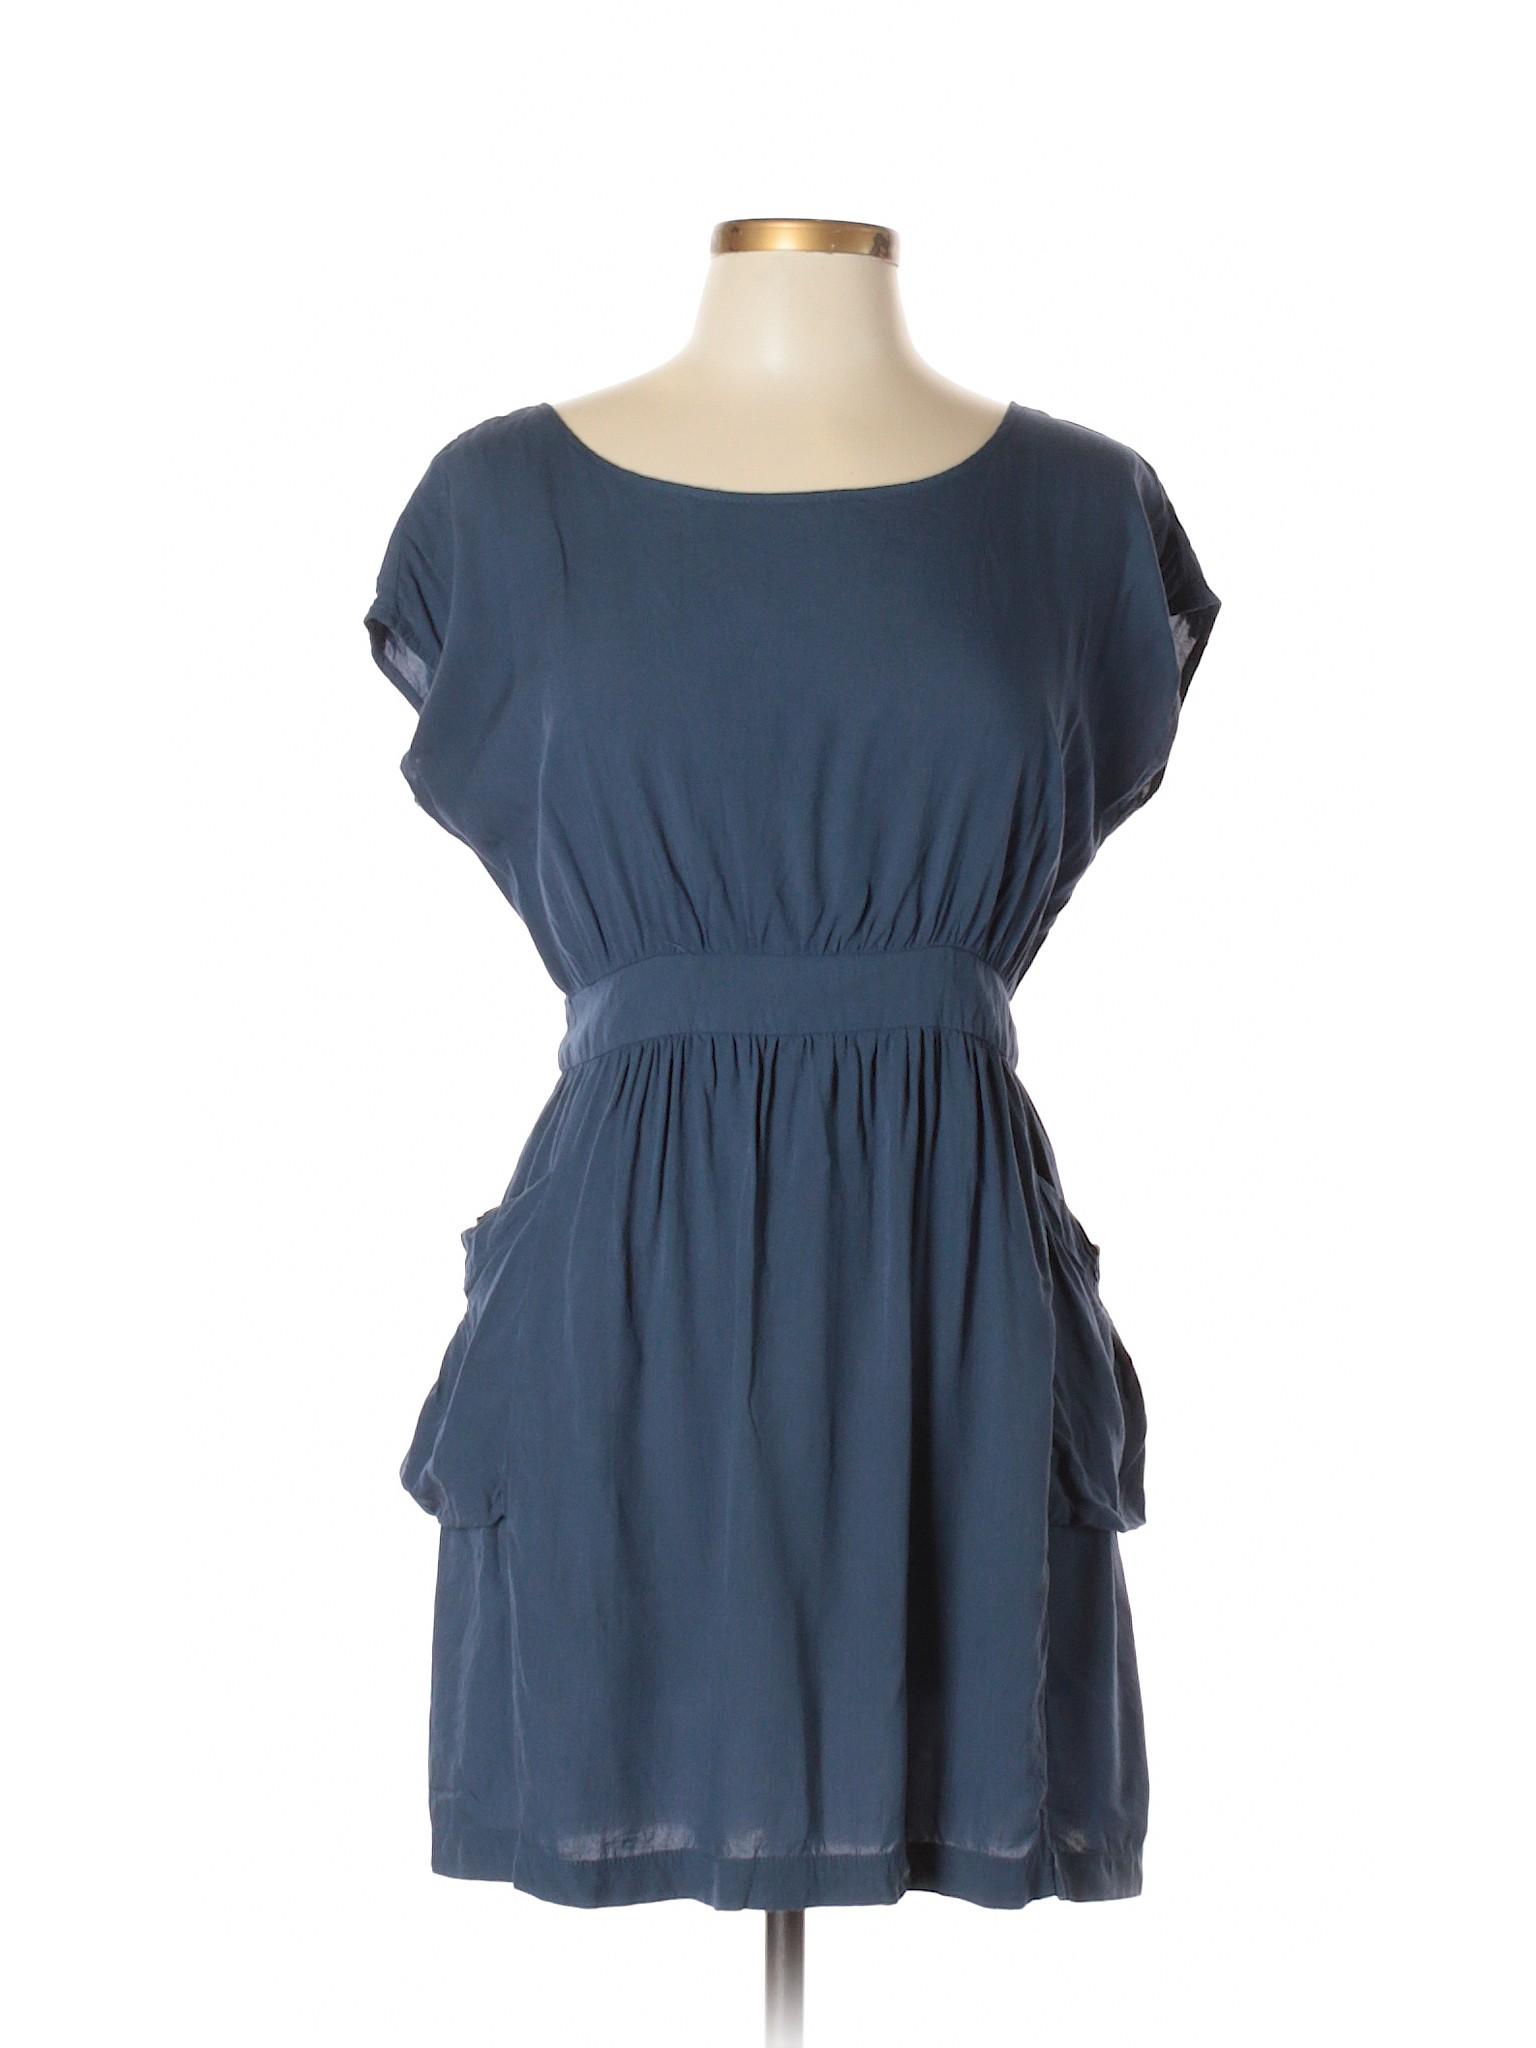 Selling Casual Foundation Selling Dress Imaginary Imaginary 5nYRfwx08